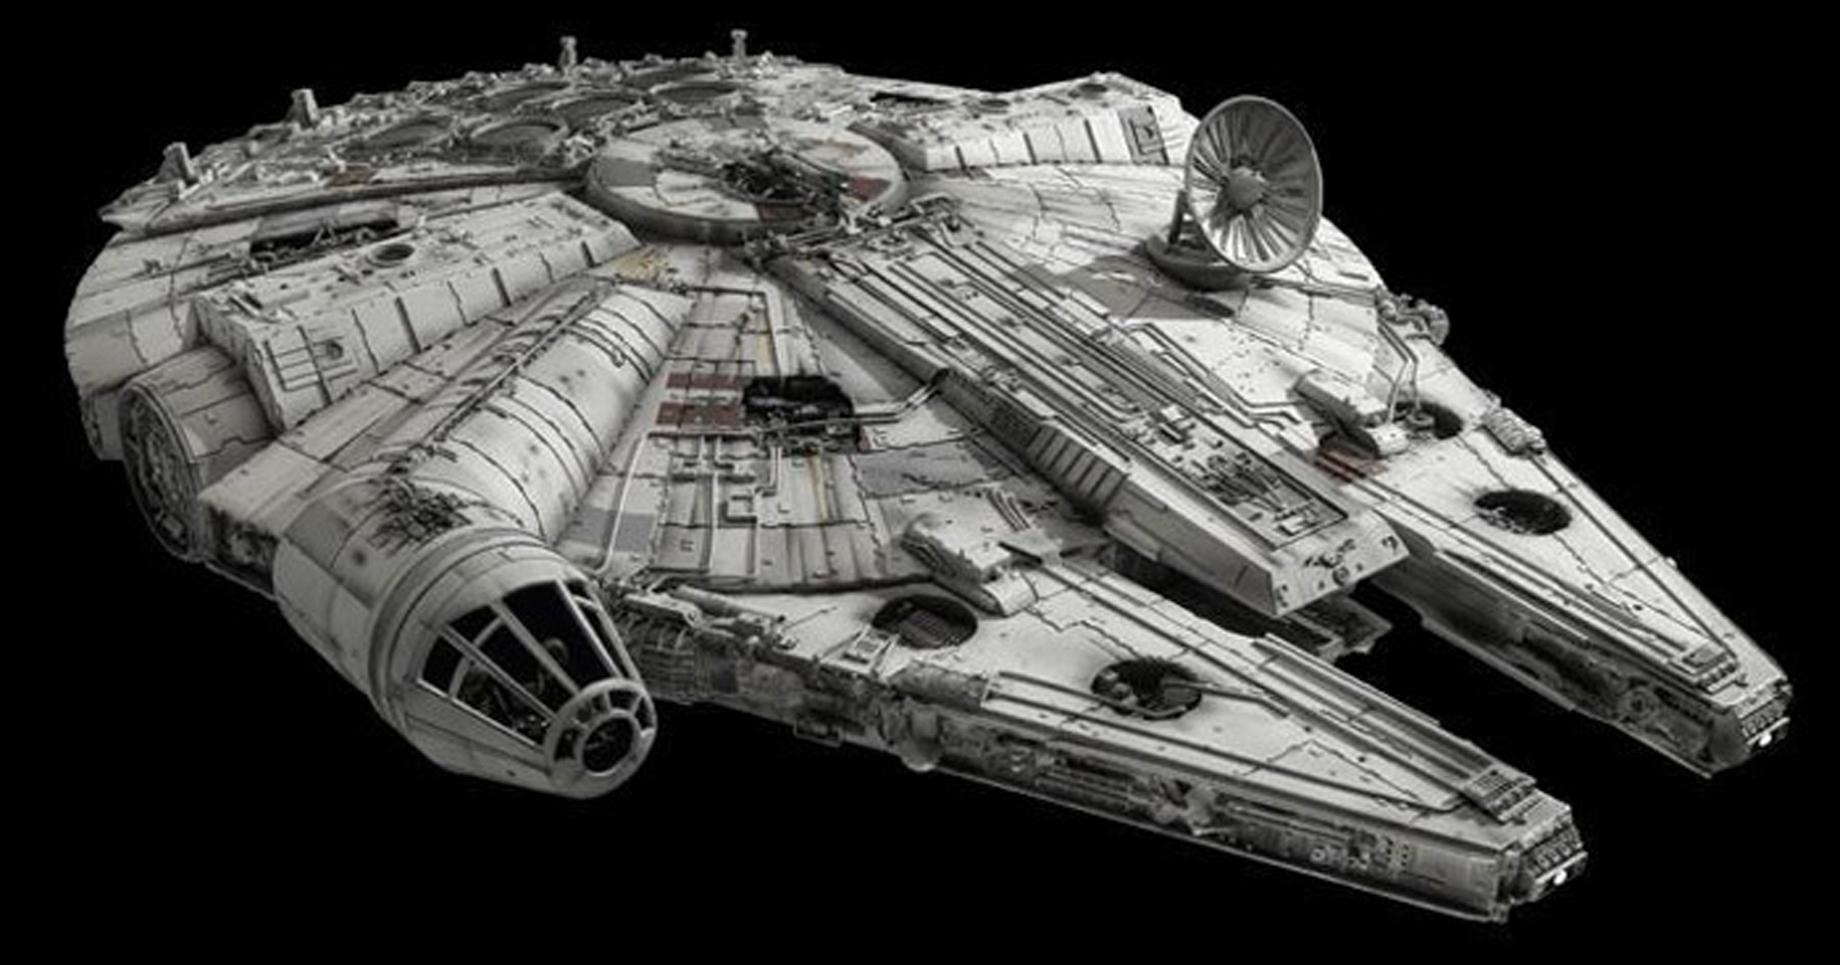 star wars millenium falcon - photo #16